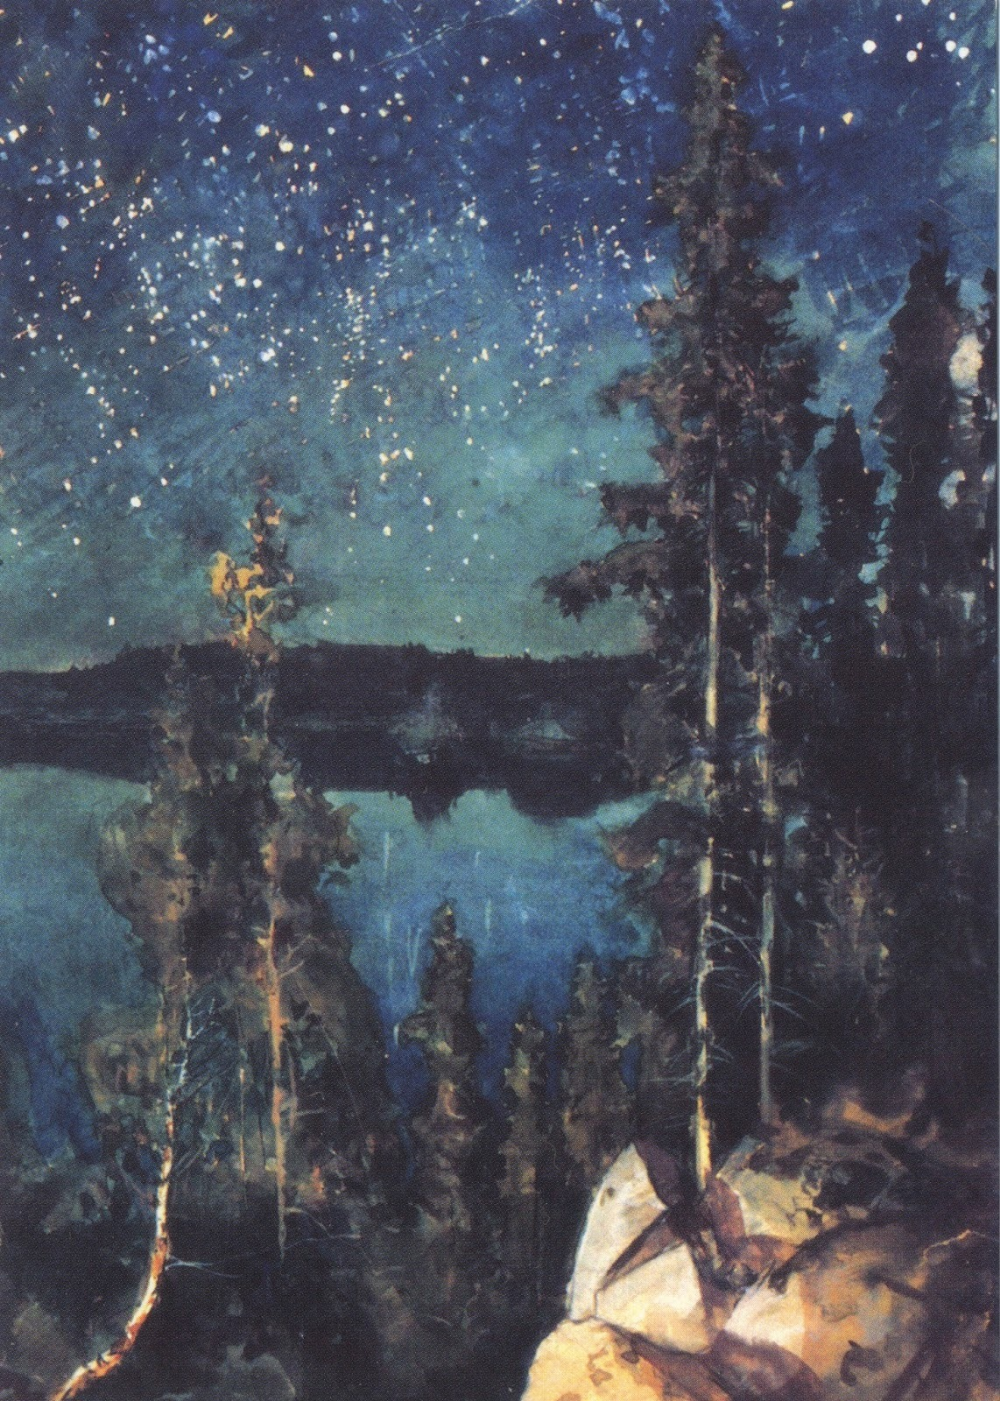 Pin By Tomek Mazur On Dungeon Black Art In 2020 Landscape Paintings Night Art Scandinavian Art